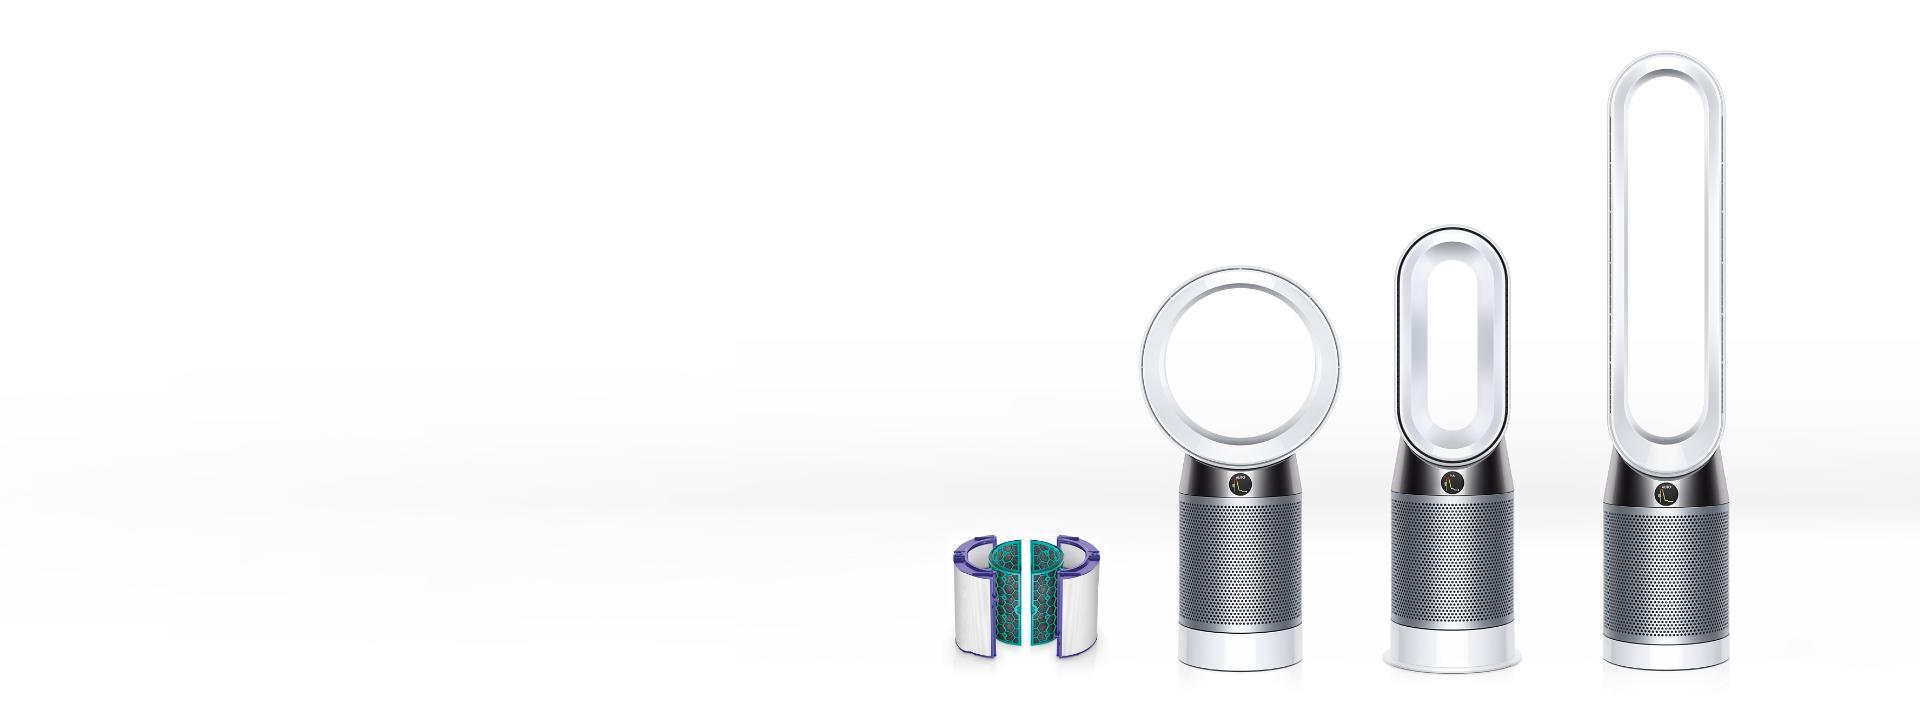 Dyson air purifiers range